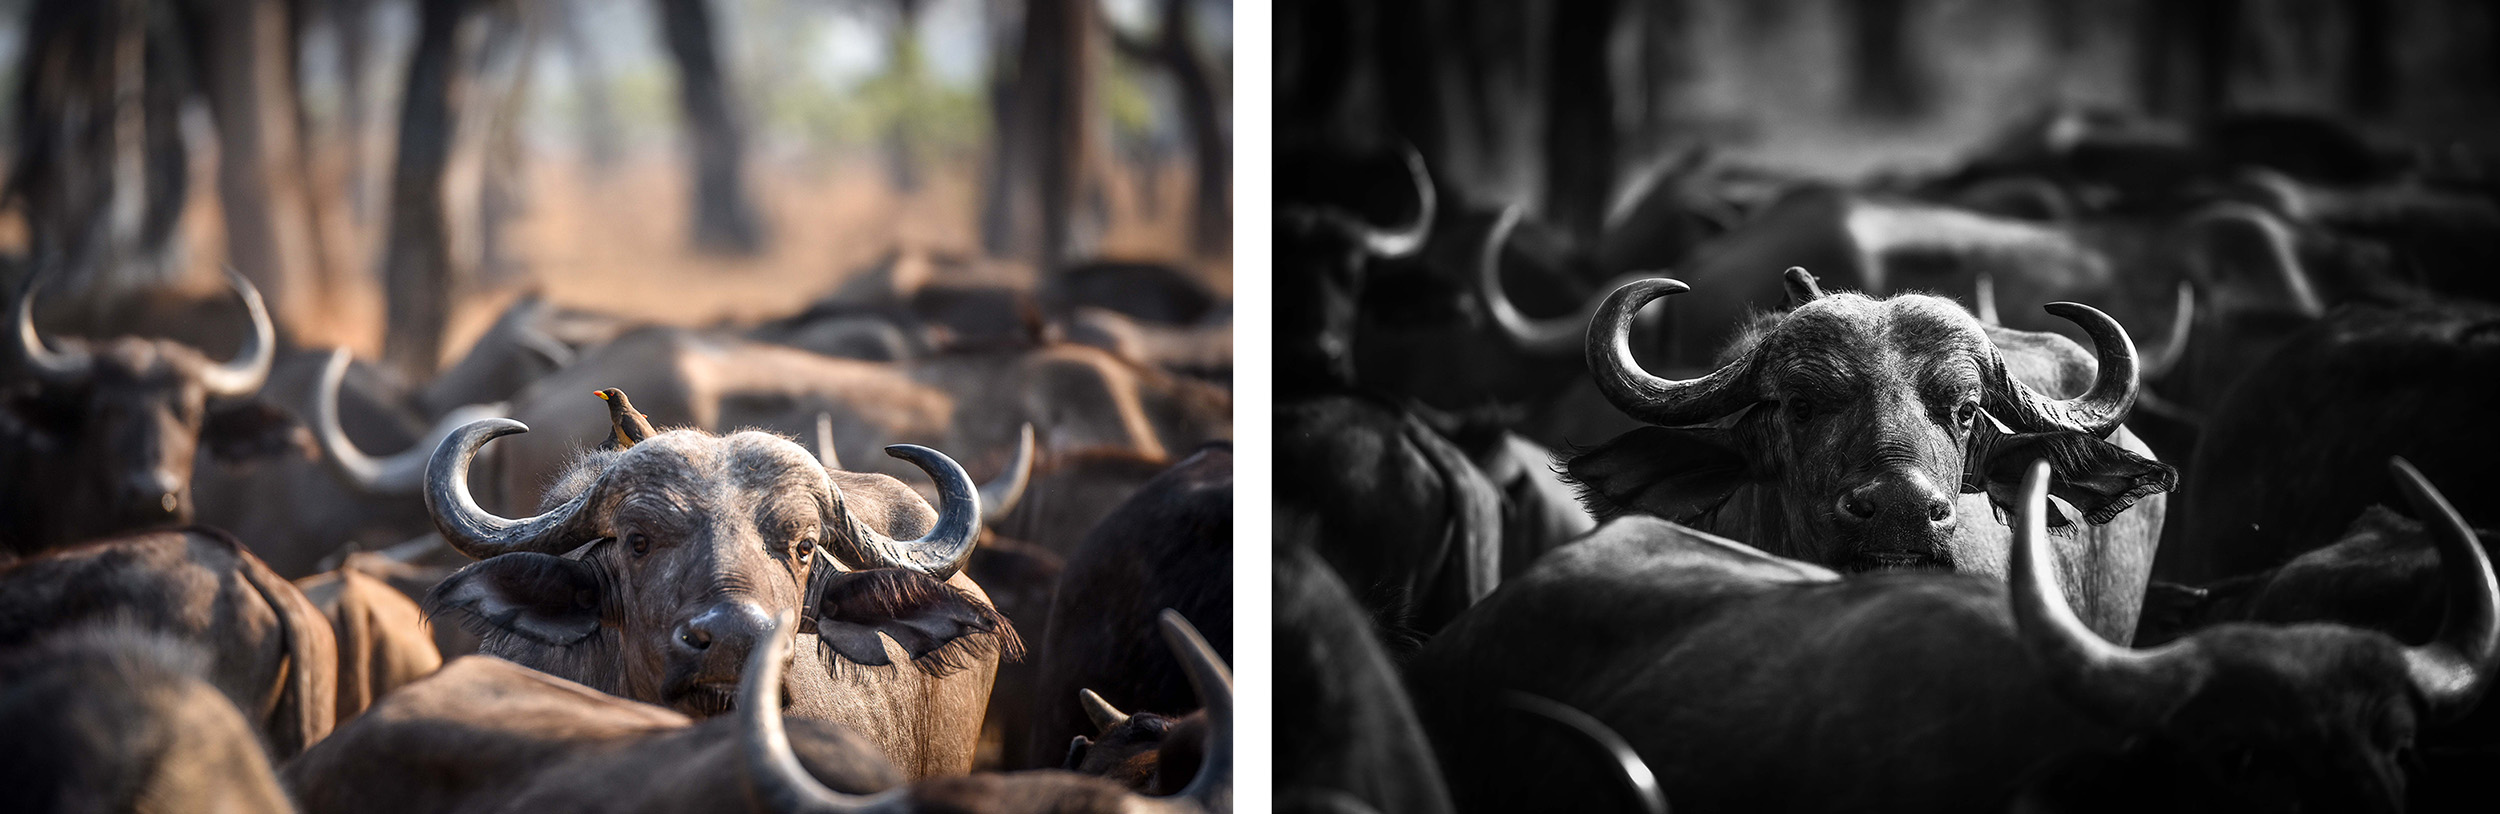 High contrast BW comparison - buffalo